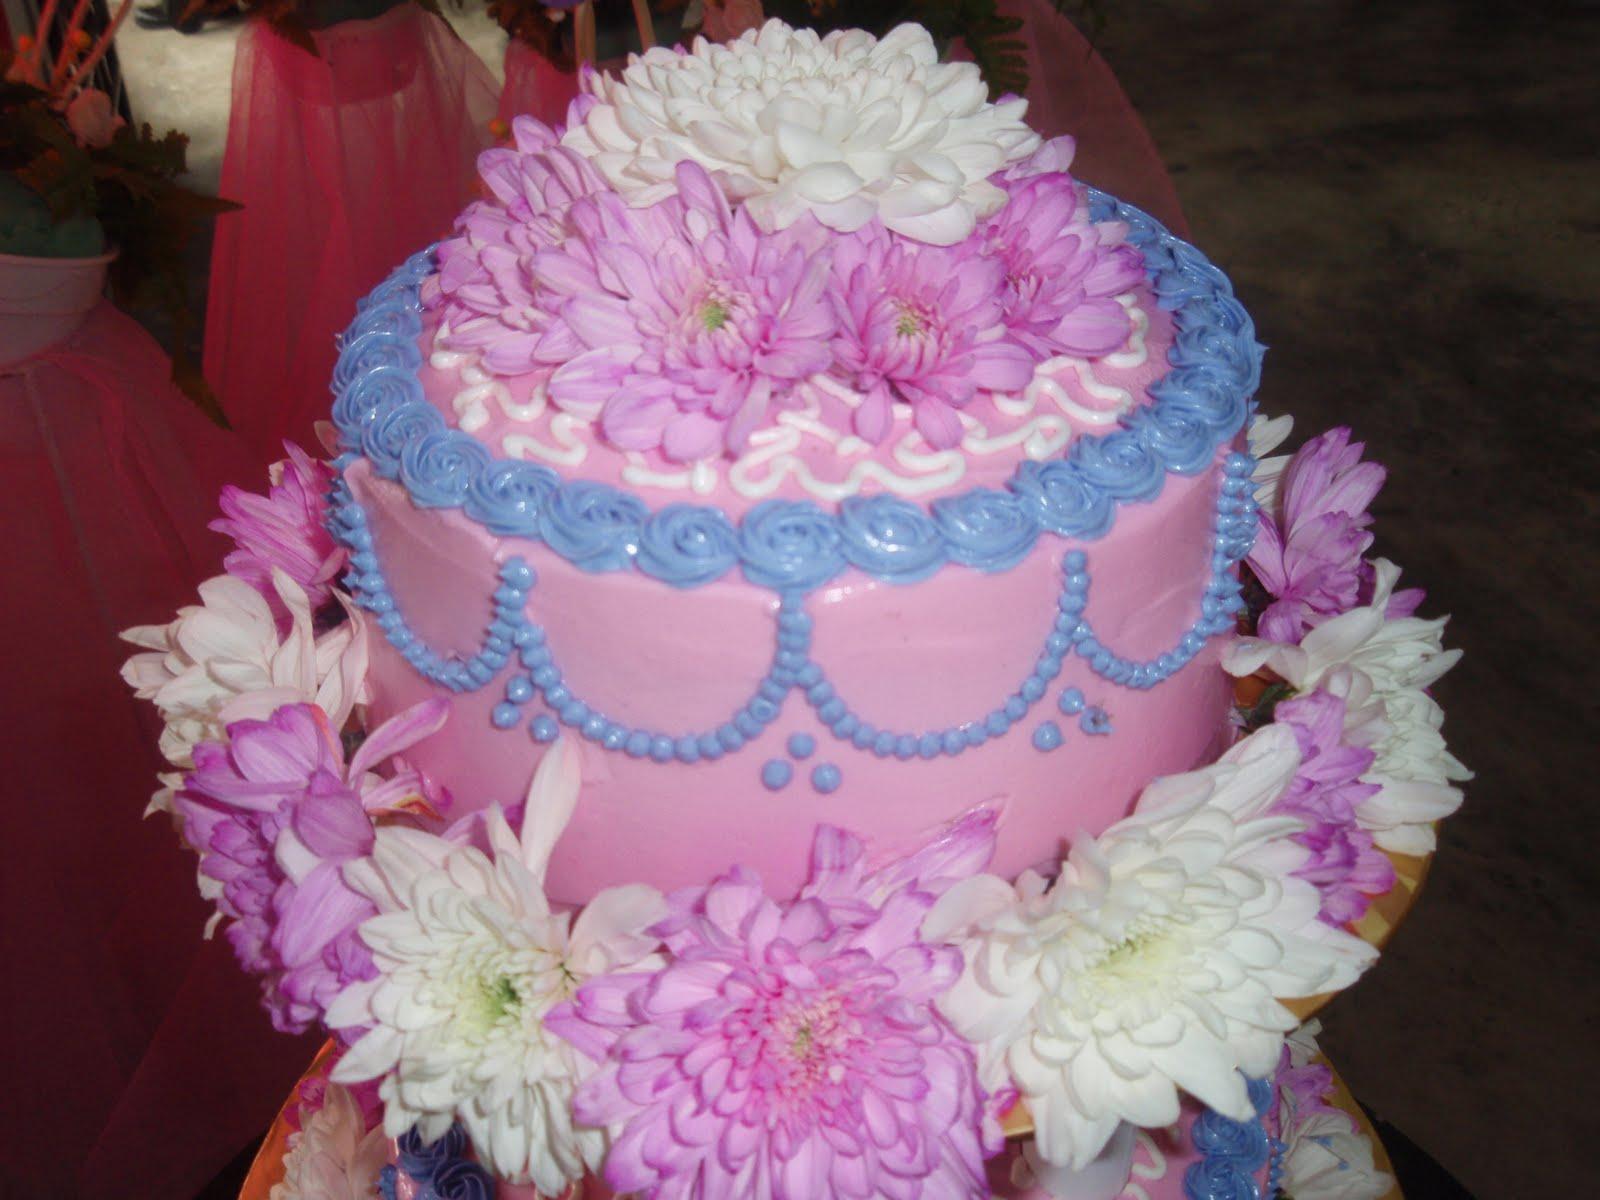 Chantique Cupcakes: fresh flower wedding cake 3 tiers